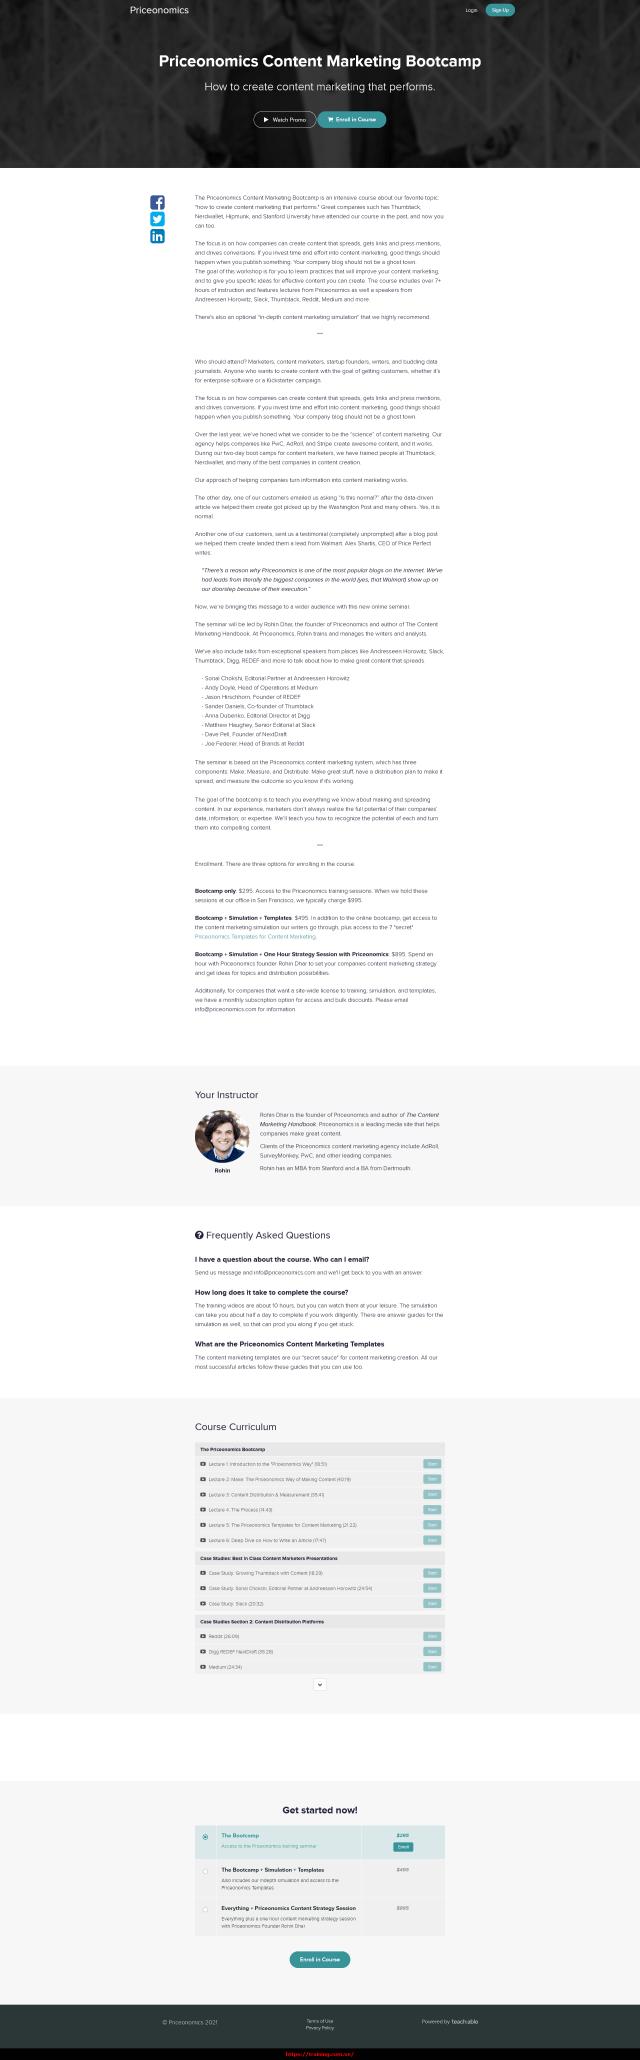 Priceonomics Content Marketing Bootcamp + Templates Sales page